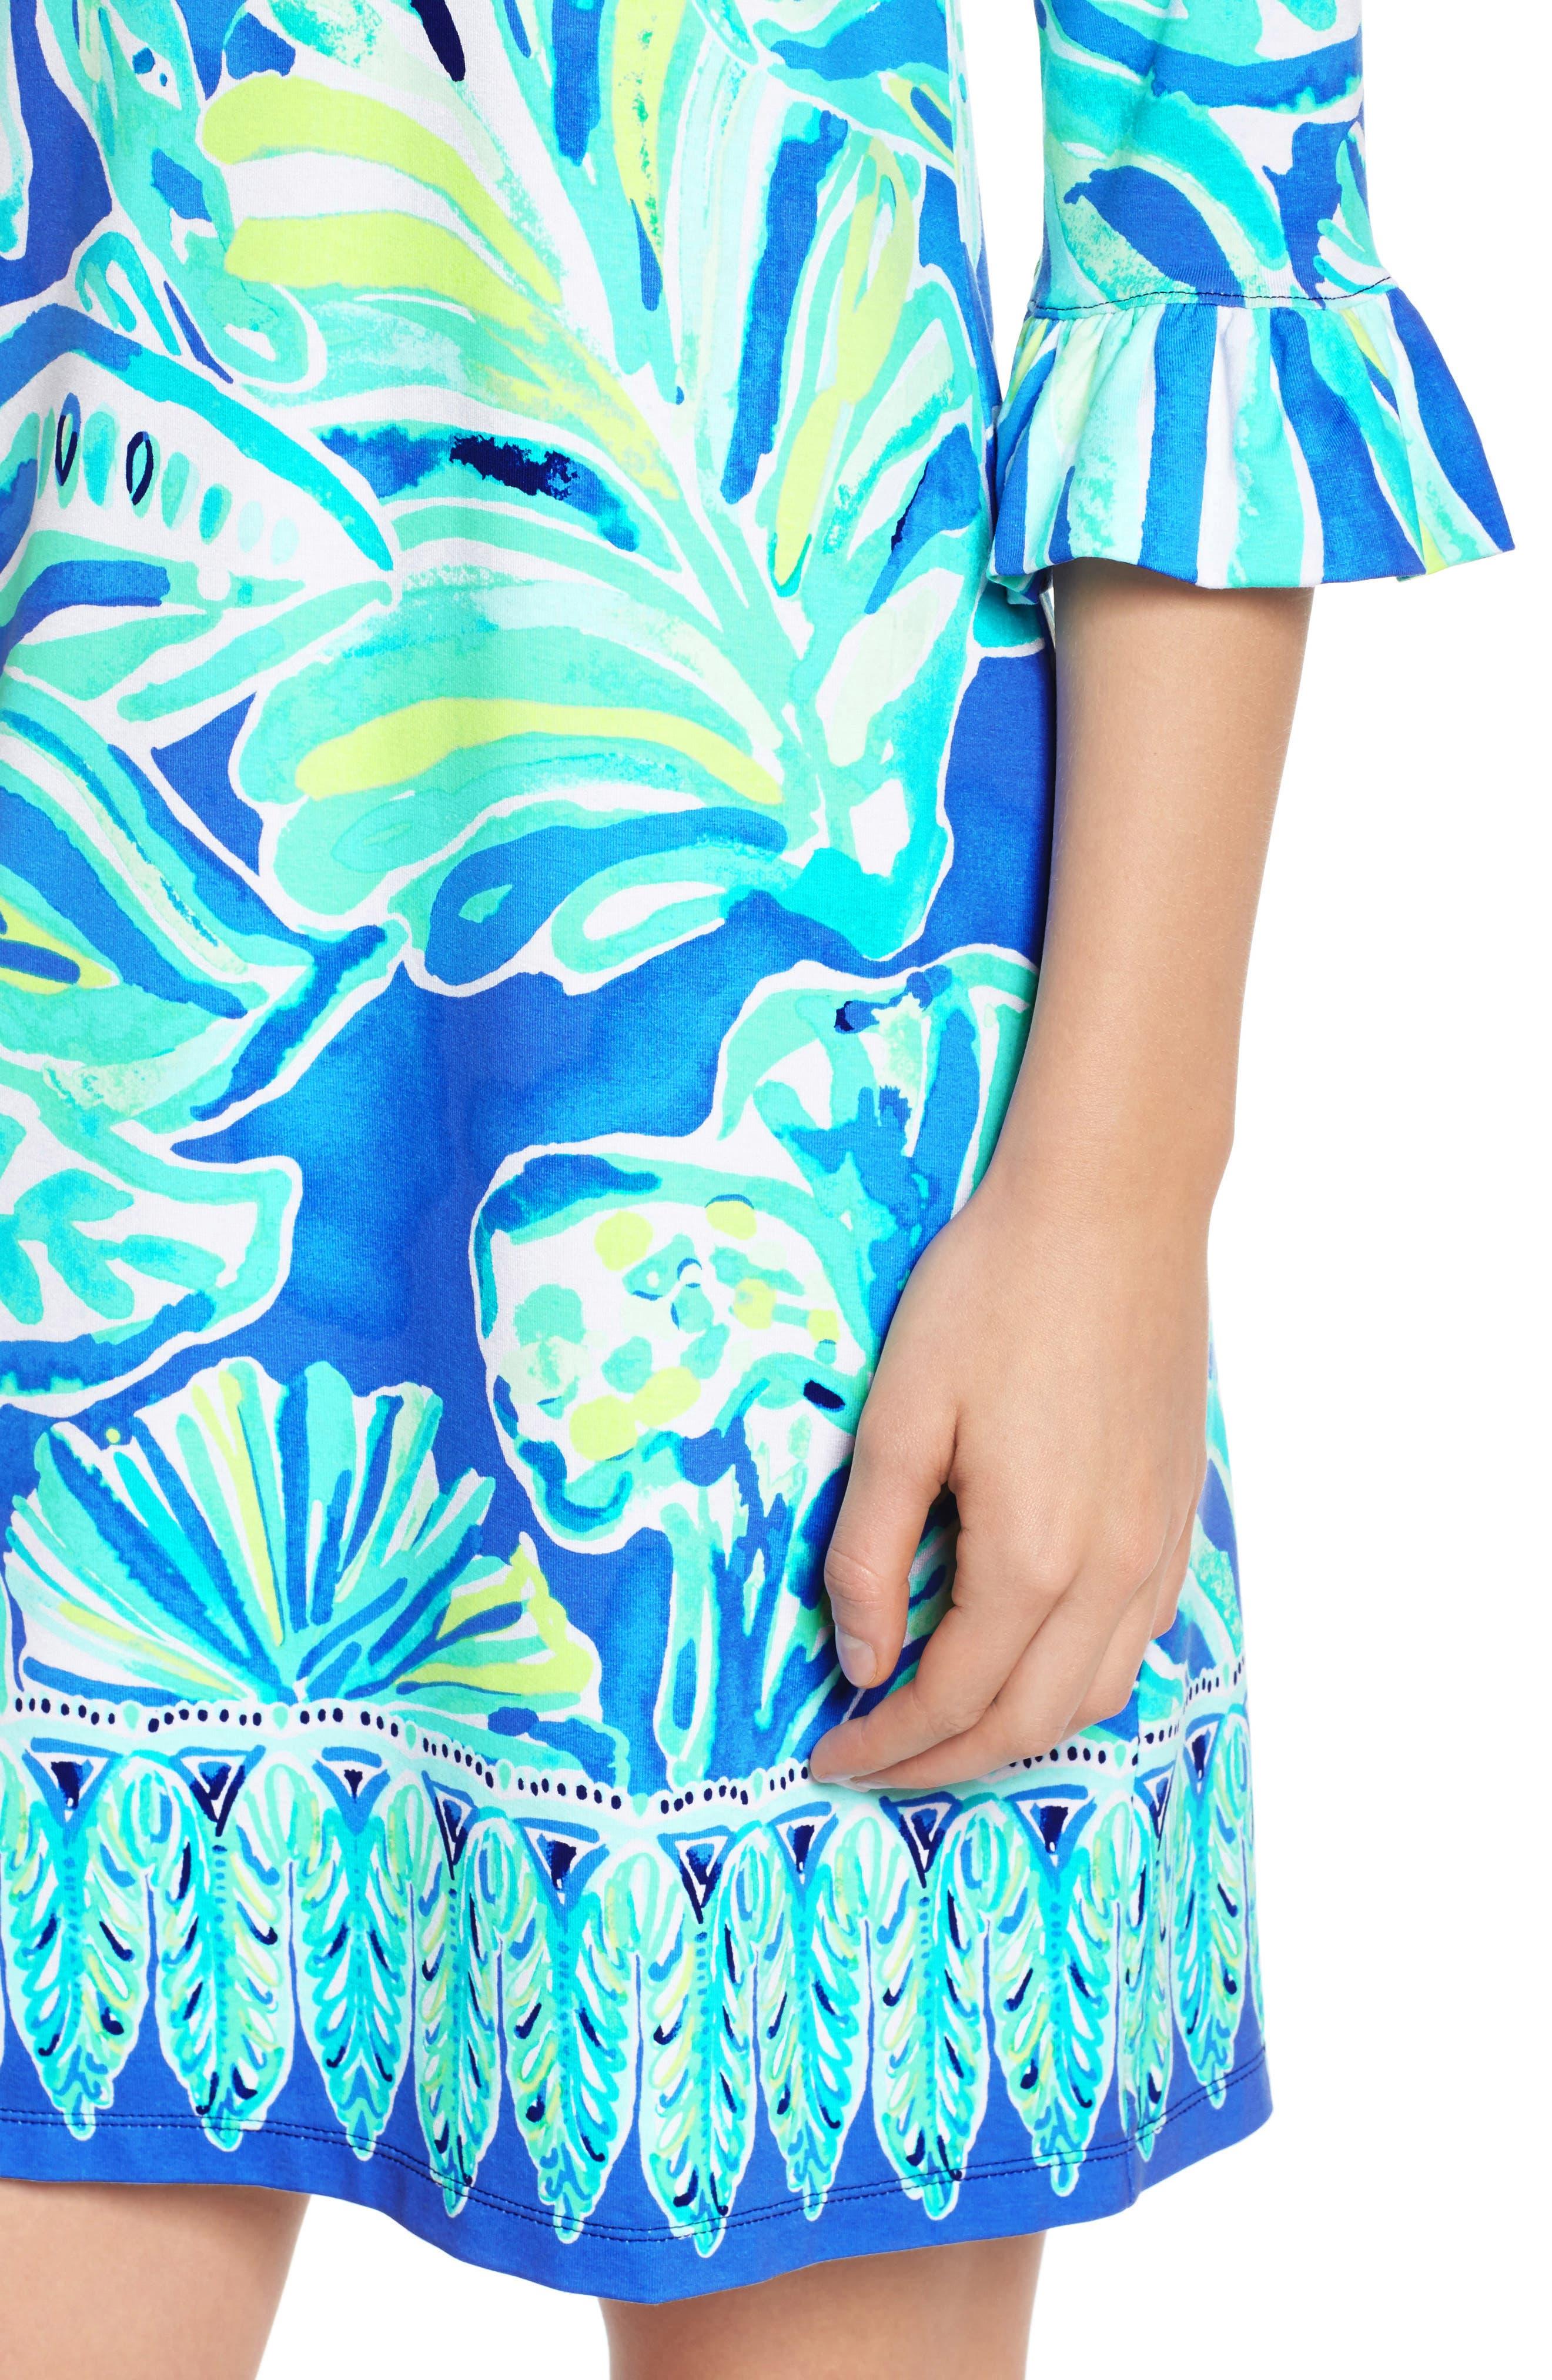 Sophie UPF 50+ Shift Dress,                             Alternate thumbnail 4, color,                             Beckon Blue Palm Passage